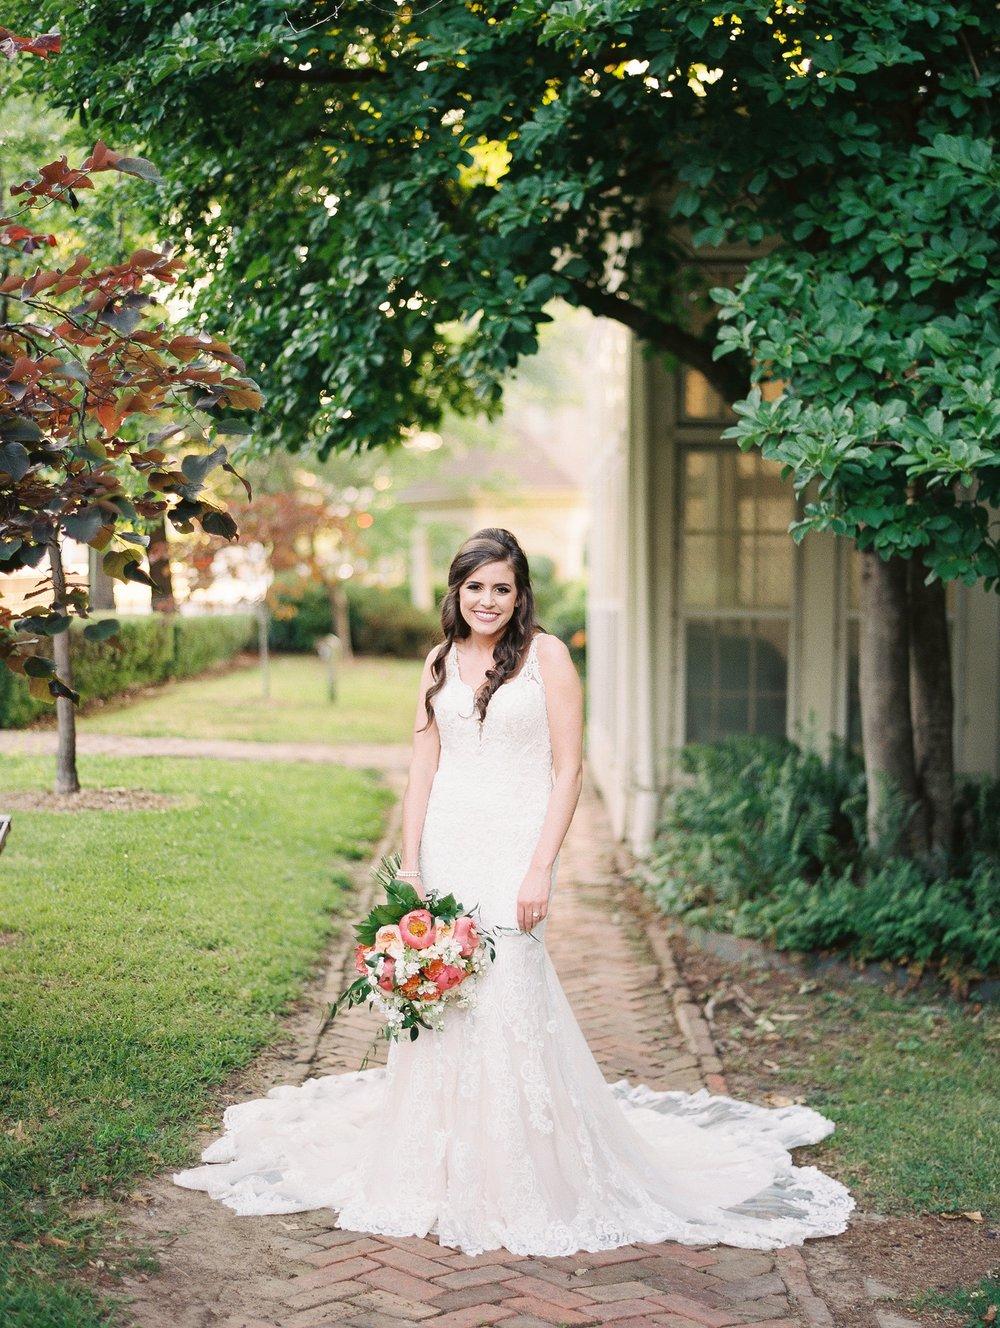 The-Terry-House-Wedding-Little-Rock-Arkansas_0091.jpg